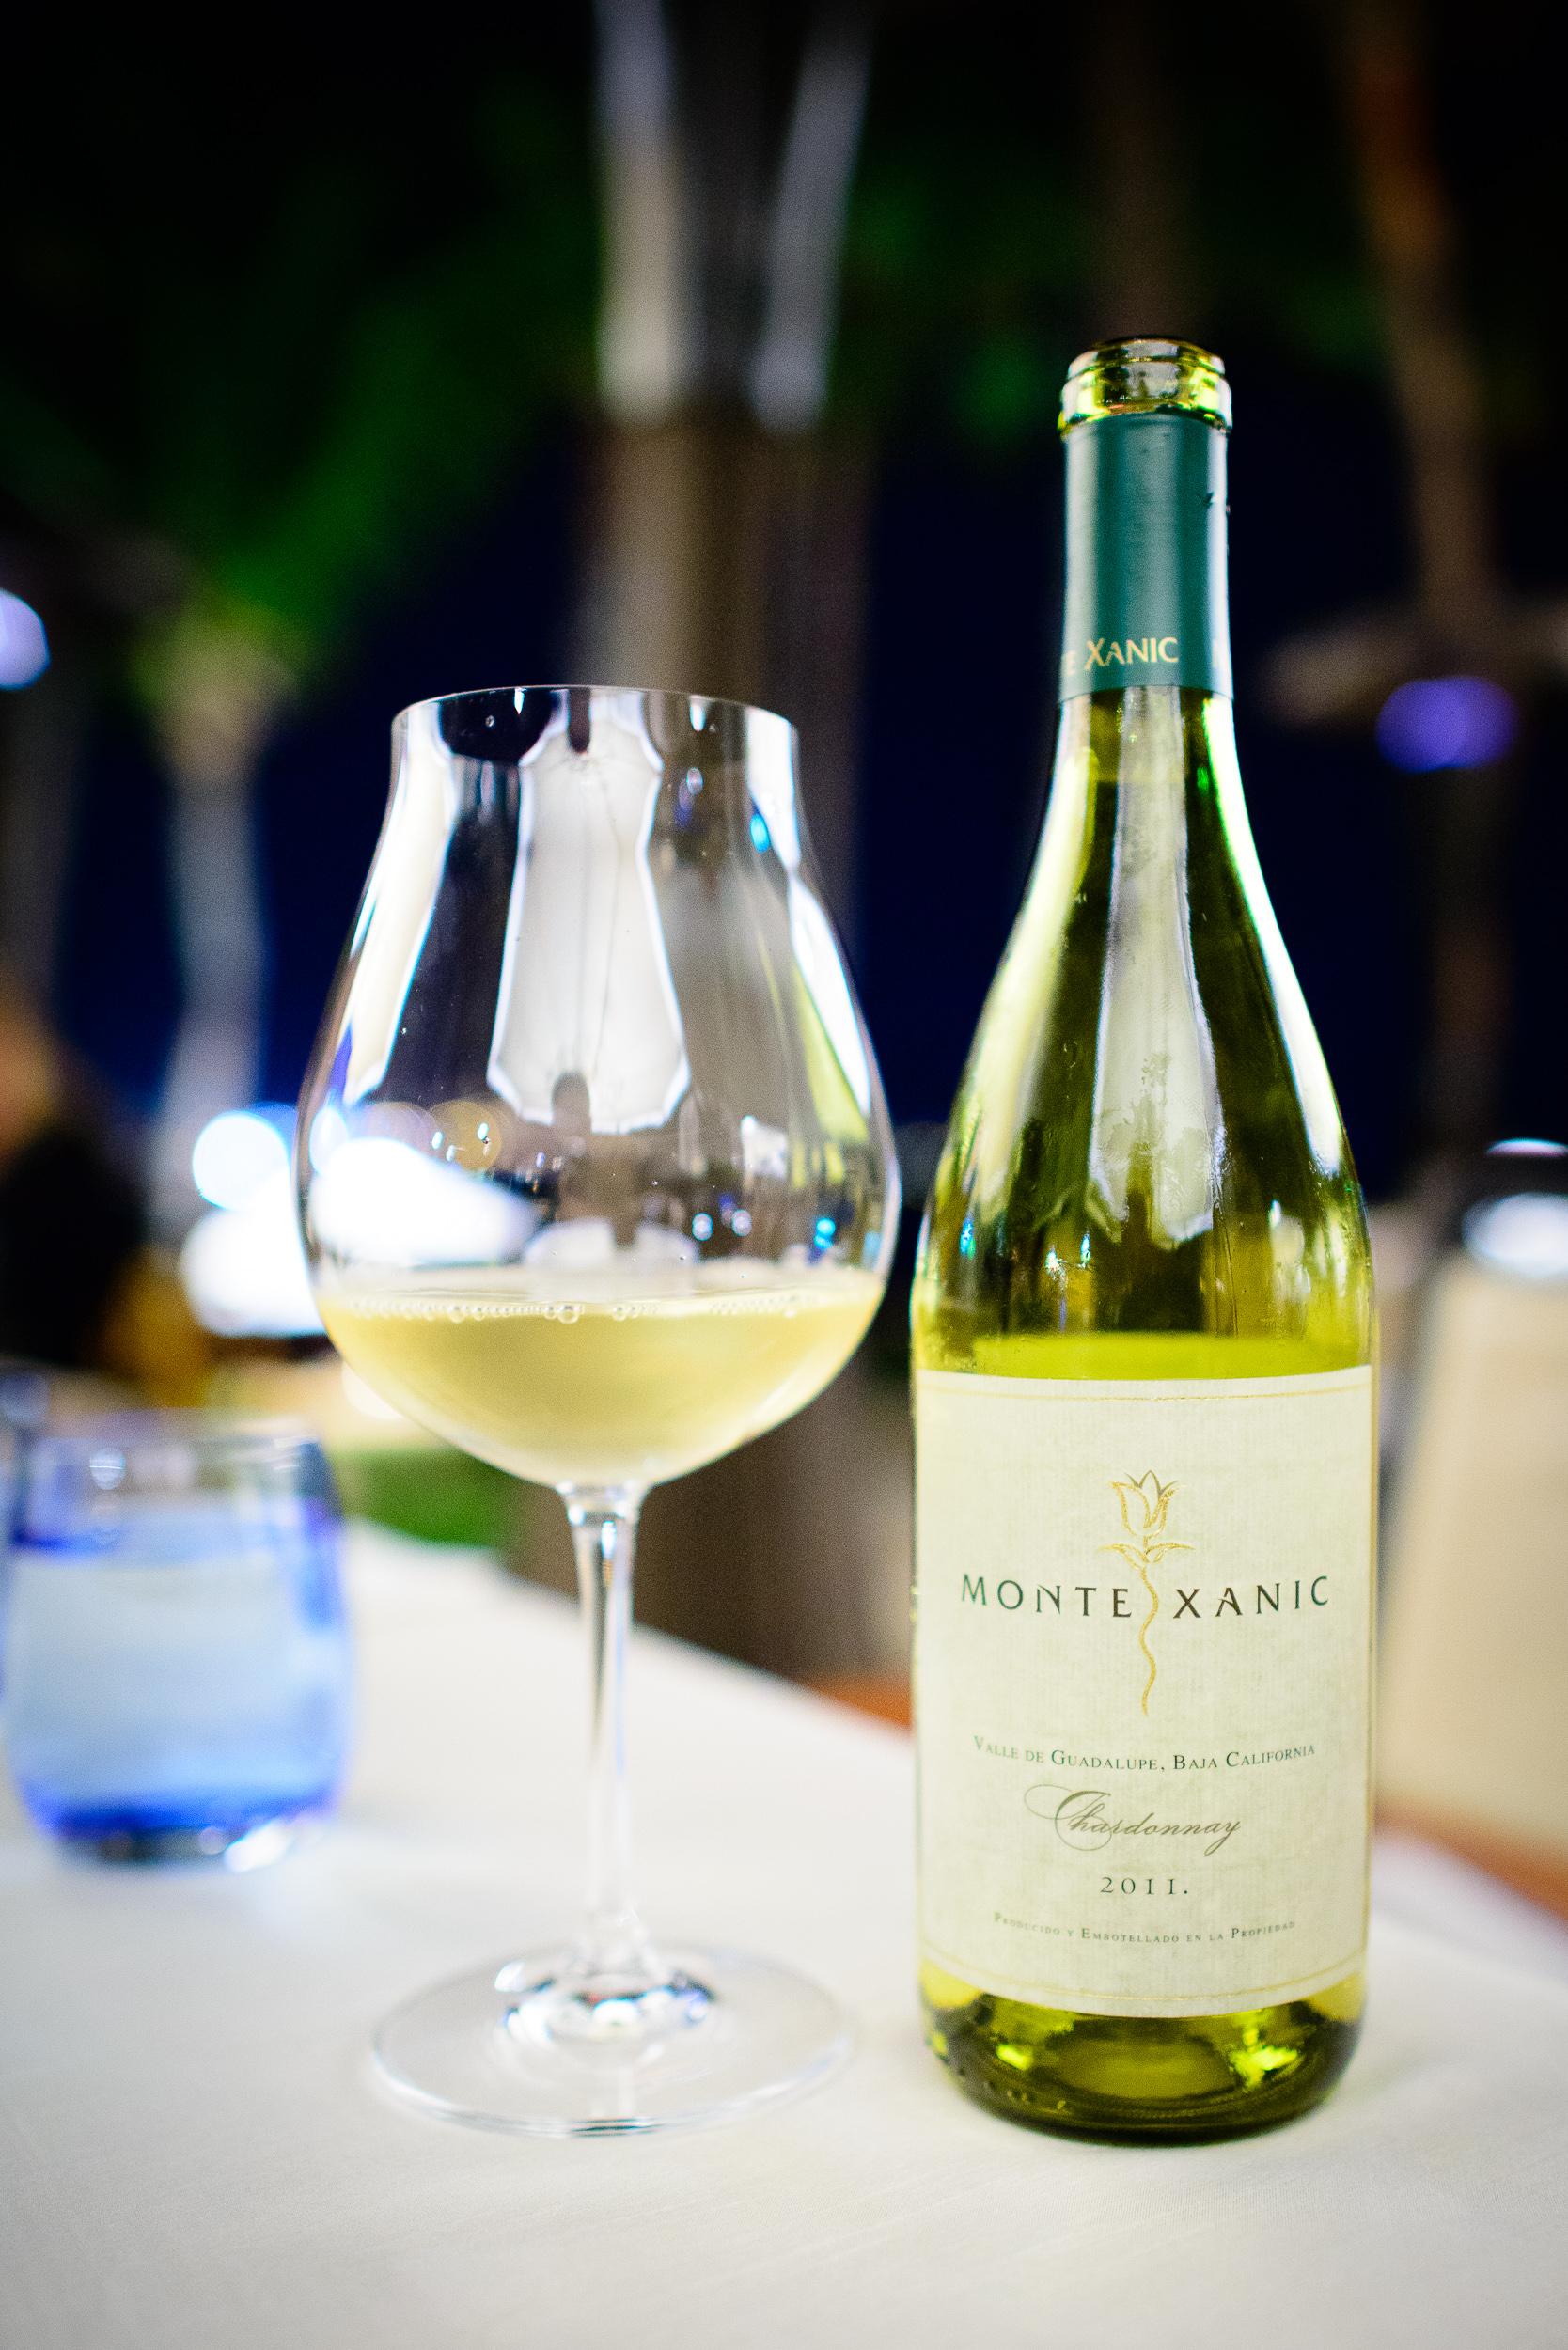 Monte Xanic Chardonnay 2011